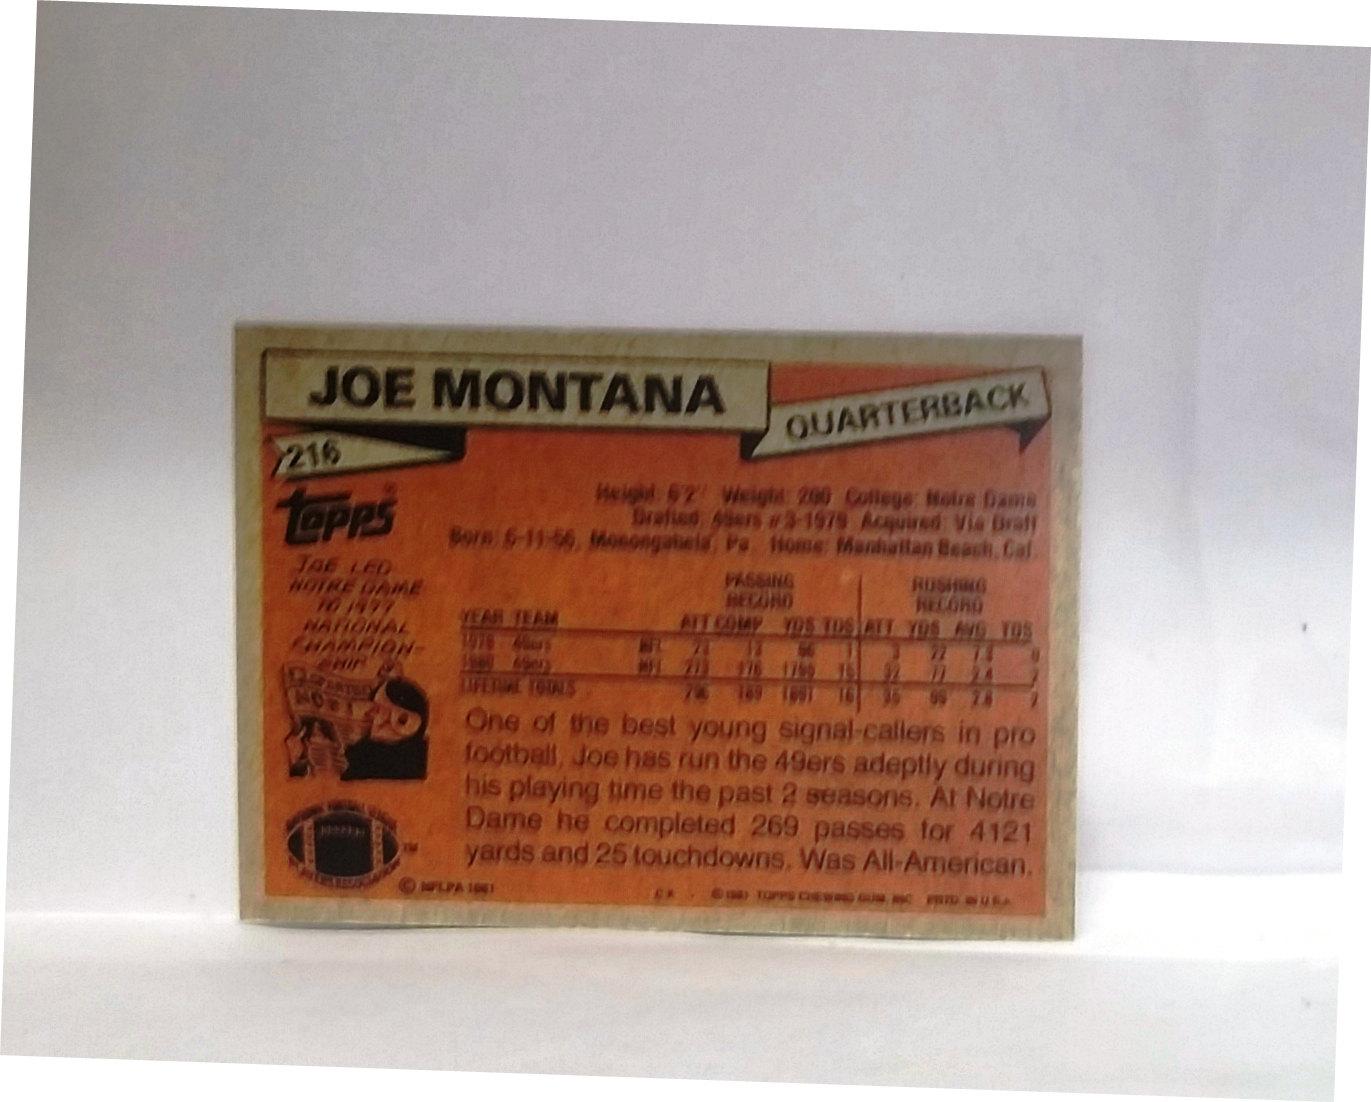 1981 Topps Joe Montana Rookie Card 216 San Francisco 49ers Rc Read From Cardboard Coins